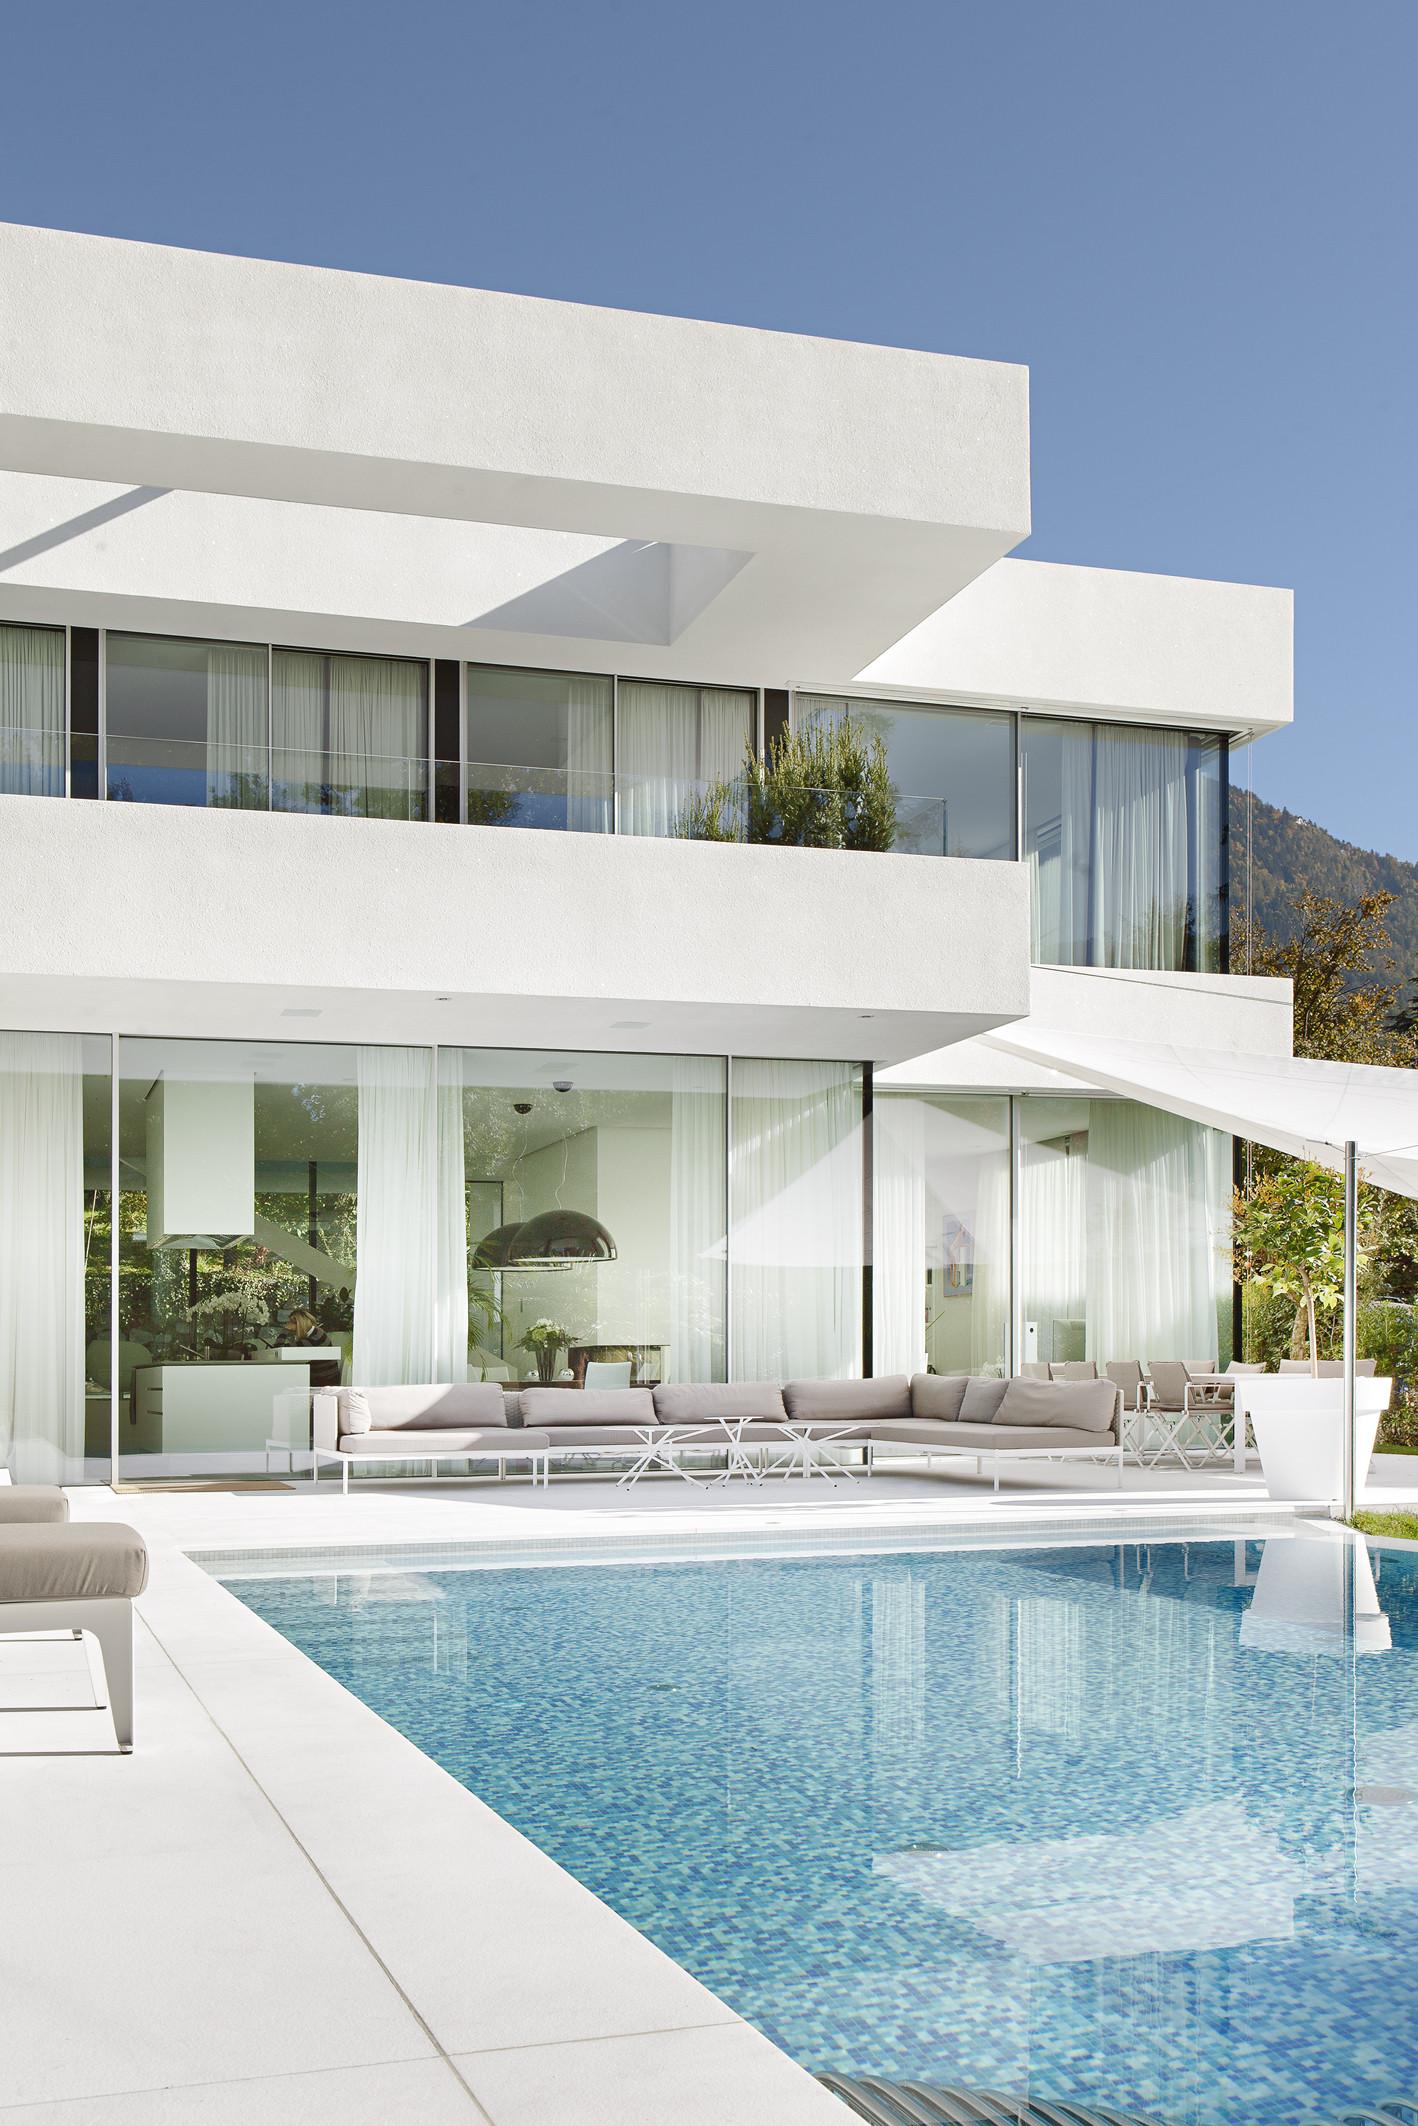 House m by monovolume architecture design in meran italy for Hotel meran design